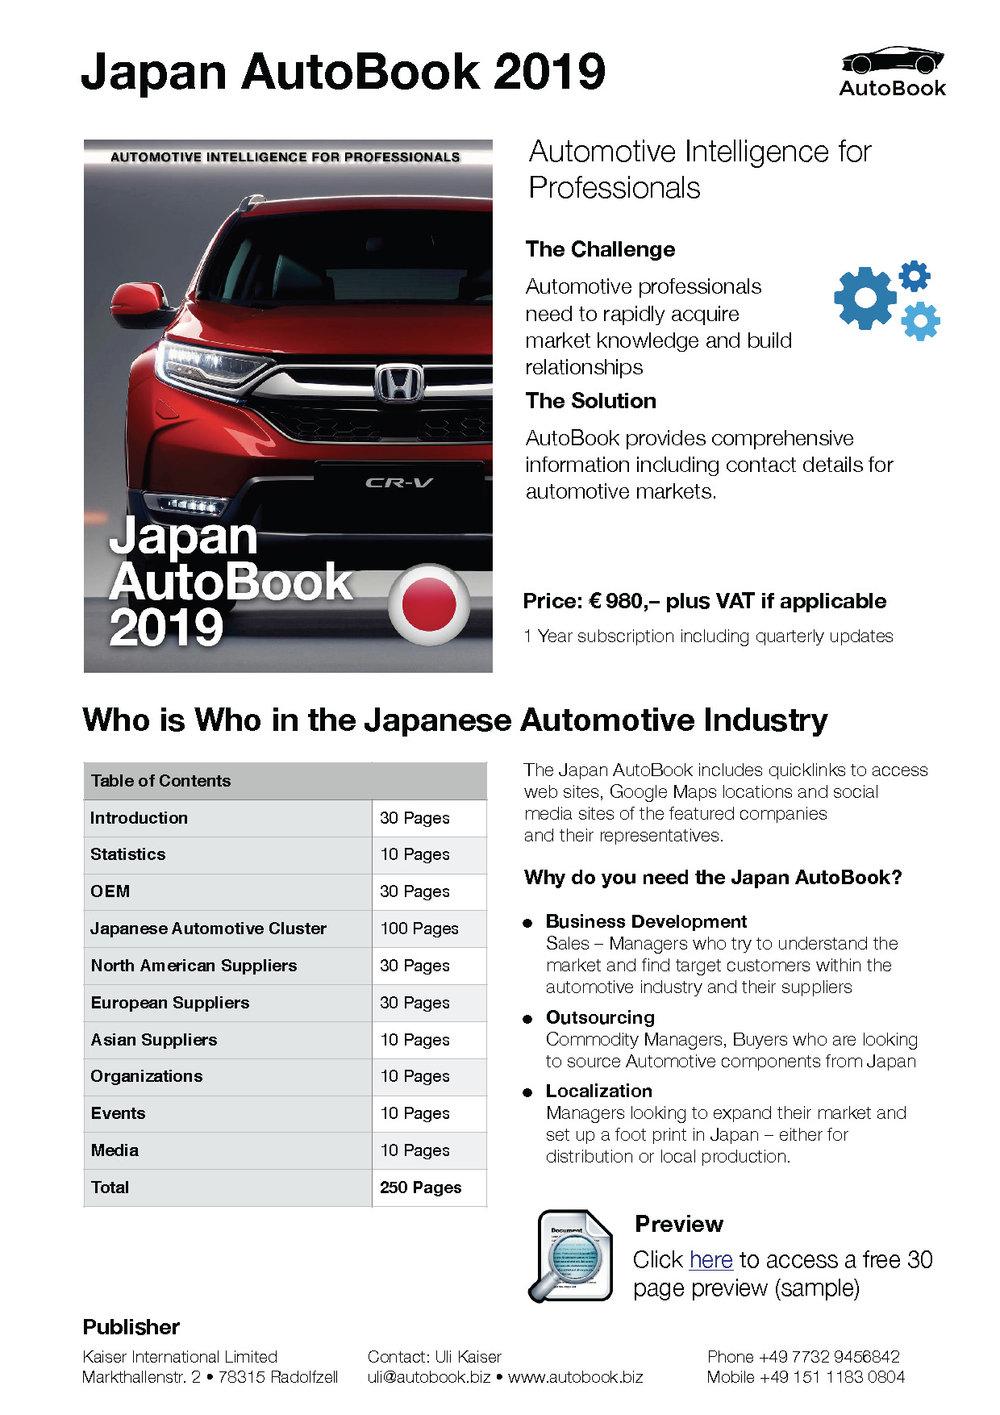 Japan AutoBook 2019 Datasheet.jpg